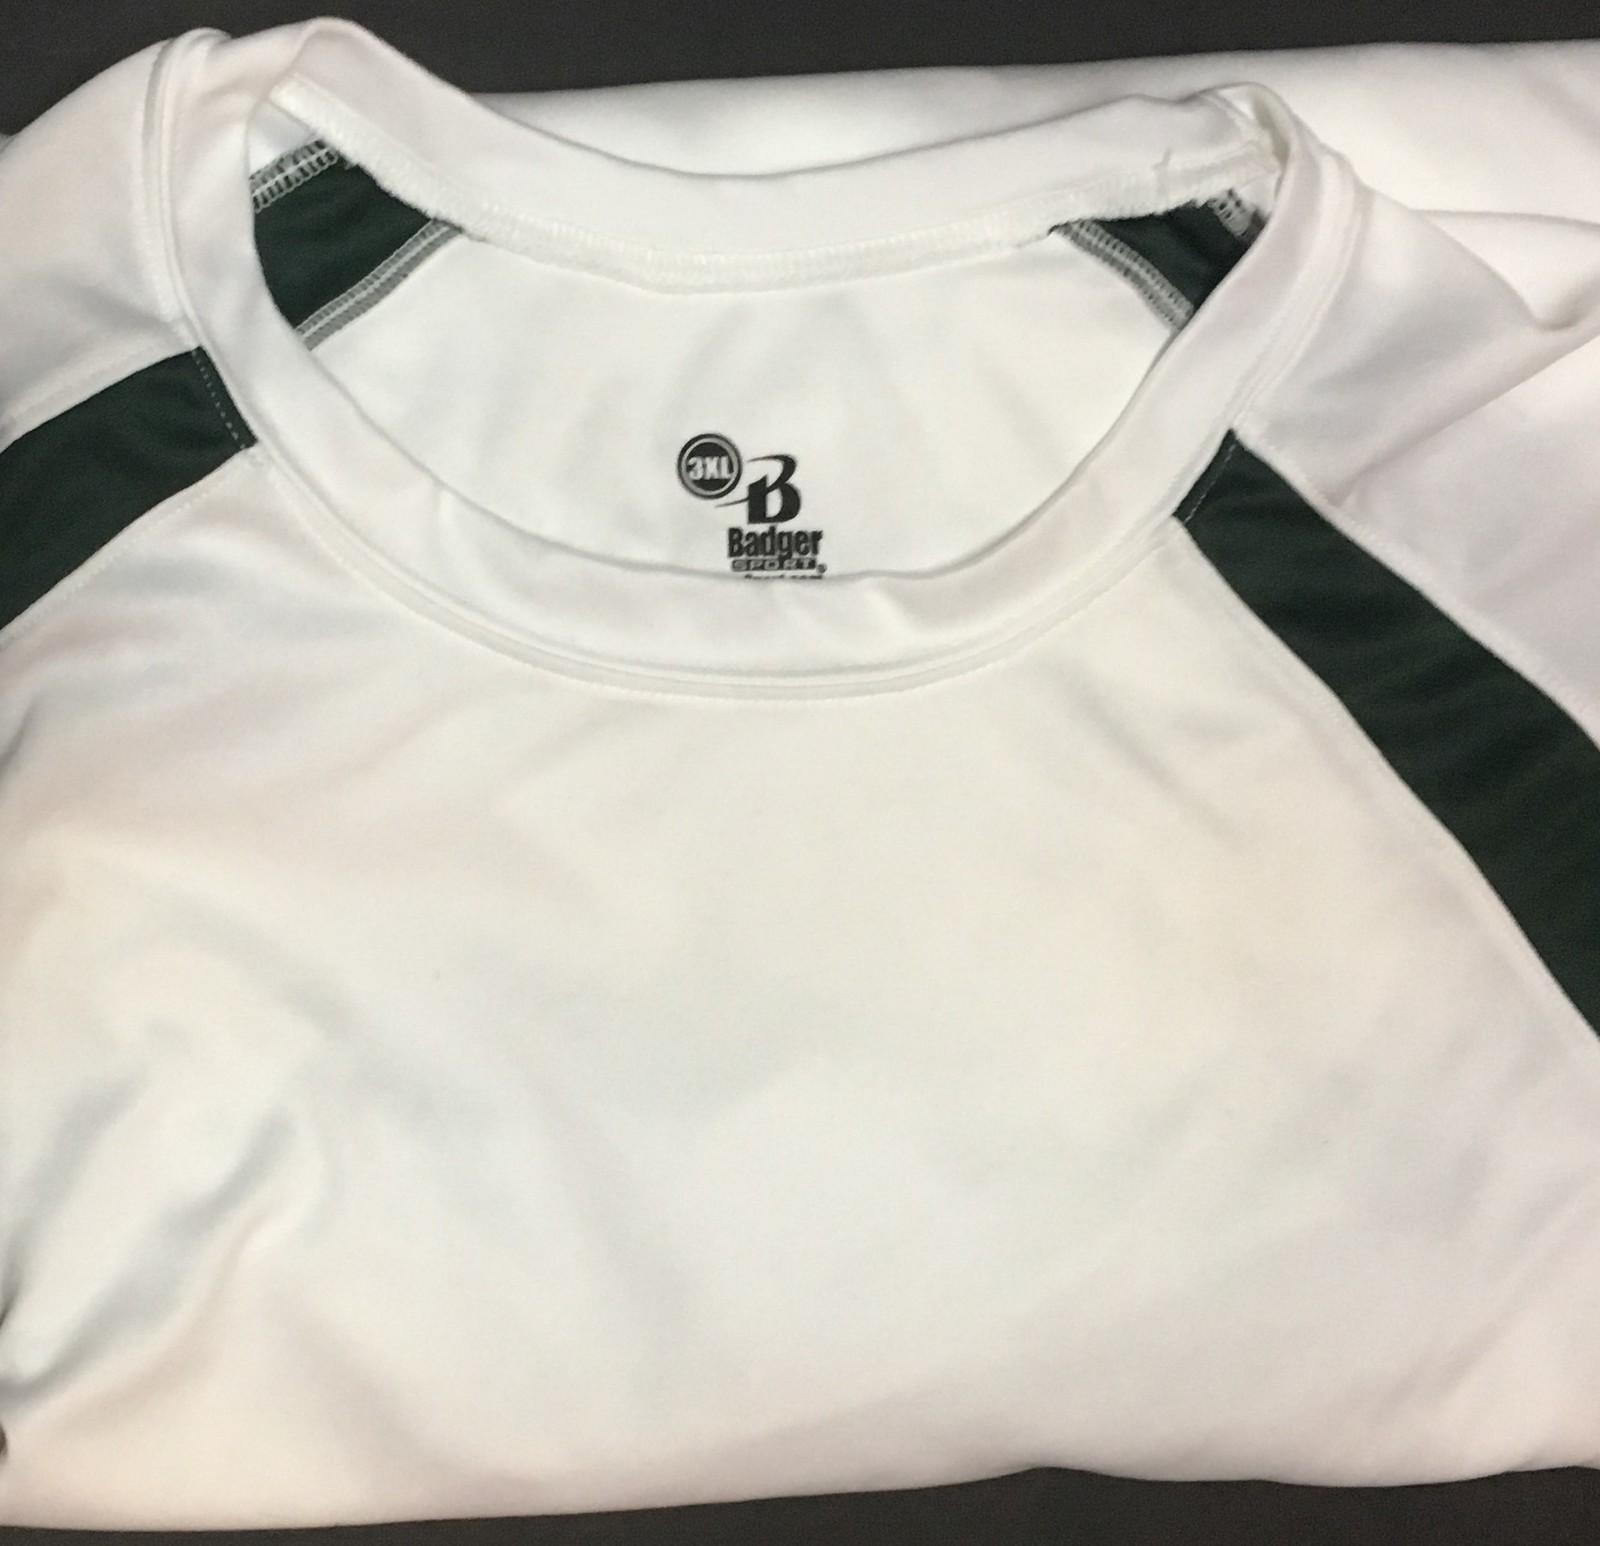 Badger Sports Men's Shirt White & Green 3XL Moisture Wicking